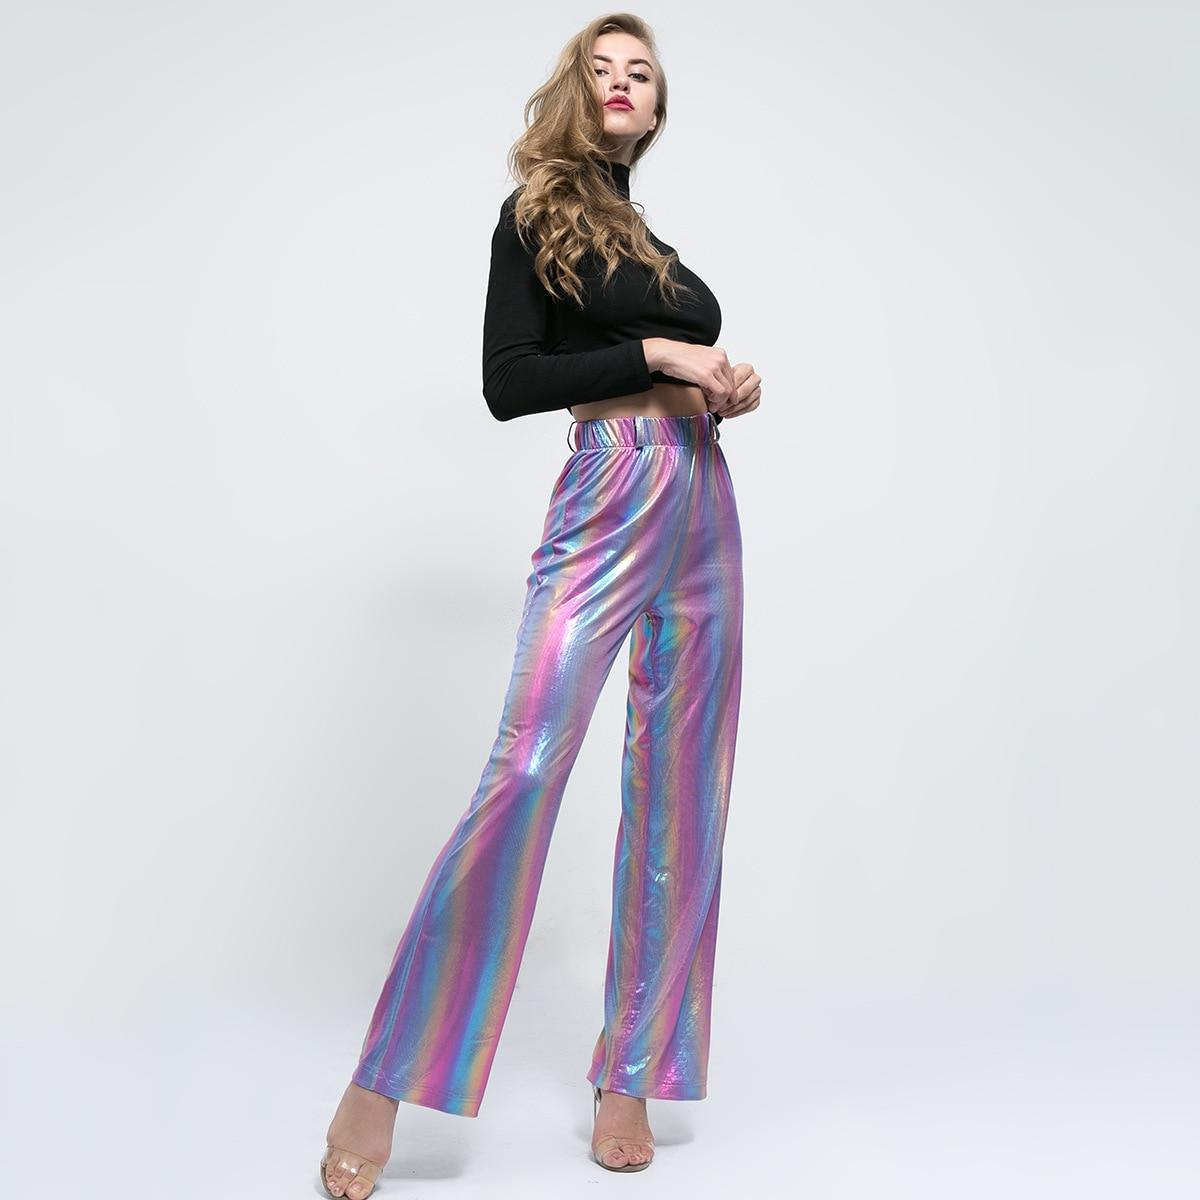 Liva Girl Long Winter Autumn Harajuku High Waist Rainbow Print   Wide     Leg     Pants   Loose Cargo Sweat   Pants   Trousers Pantalones Mujer